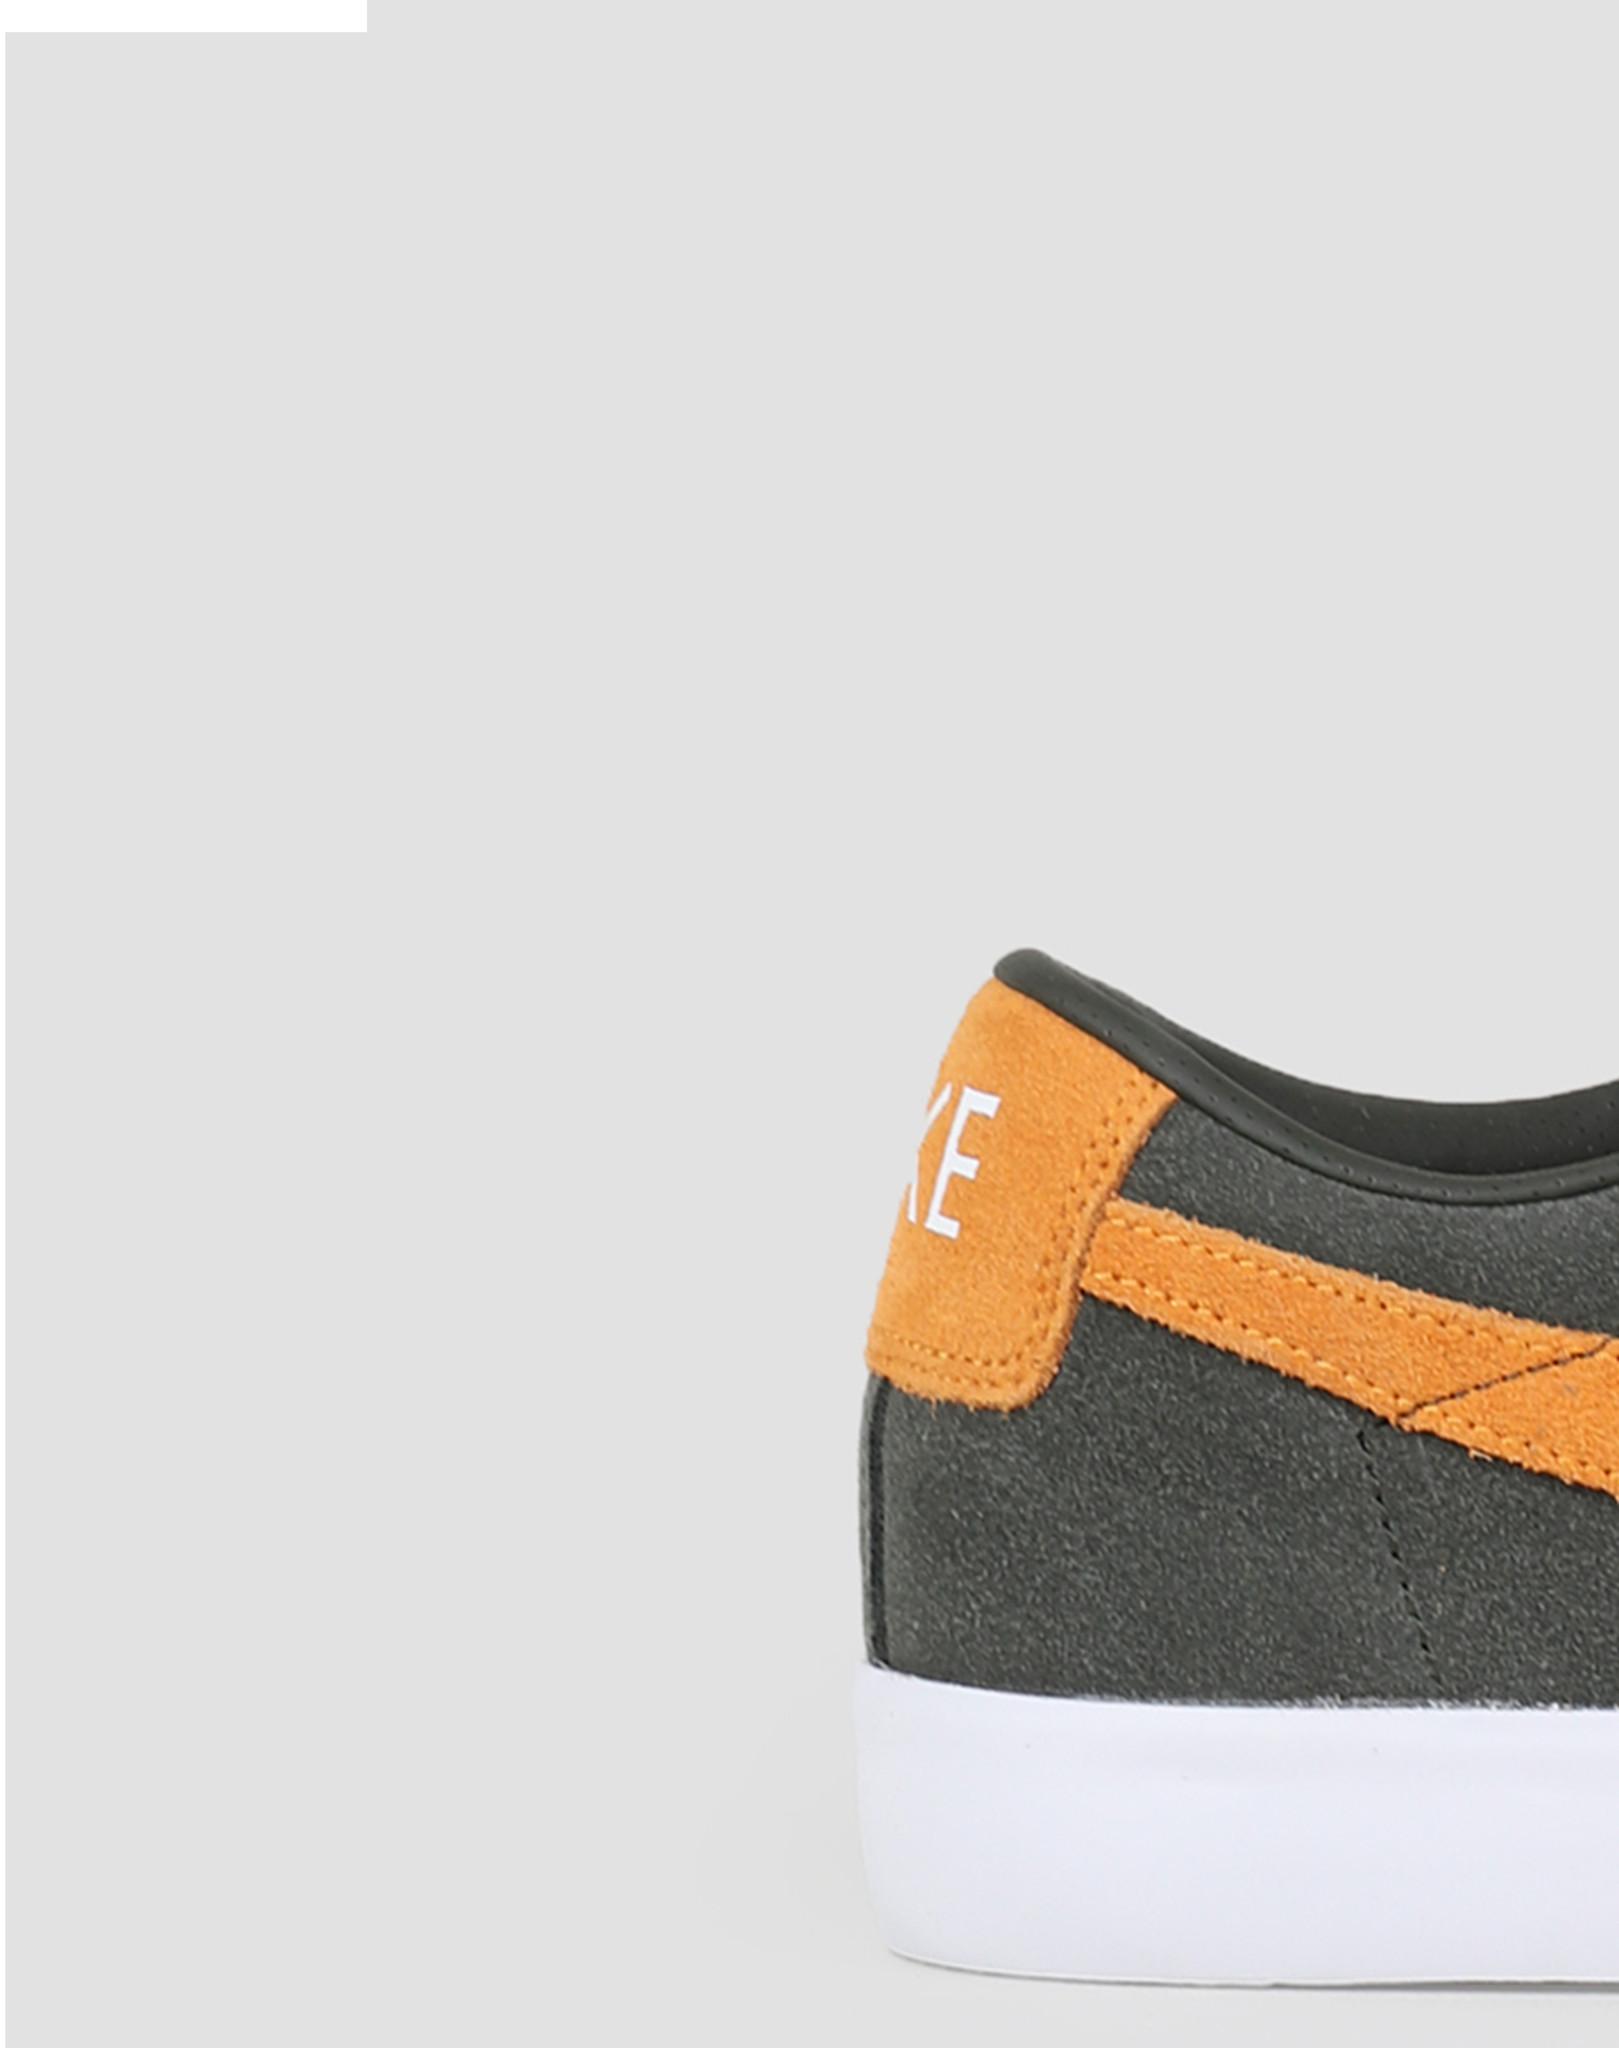 Nike Nike SB Blazer Low GT Sequoia Kumquat White Gum Light Brown 704939 302